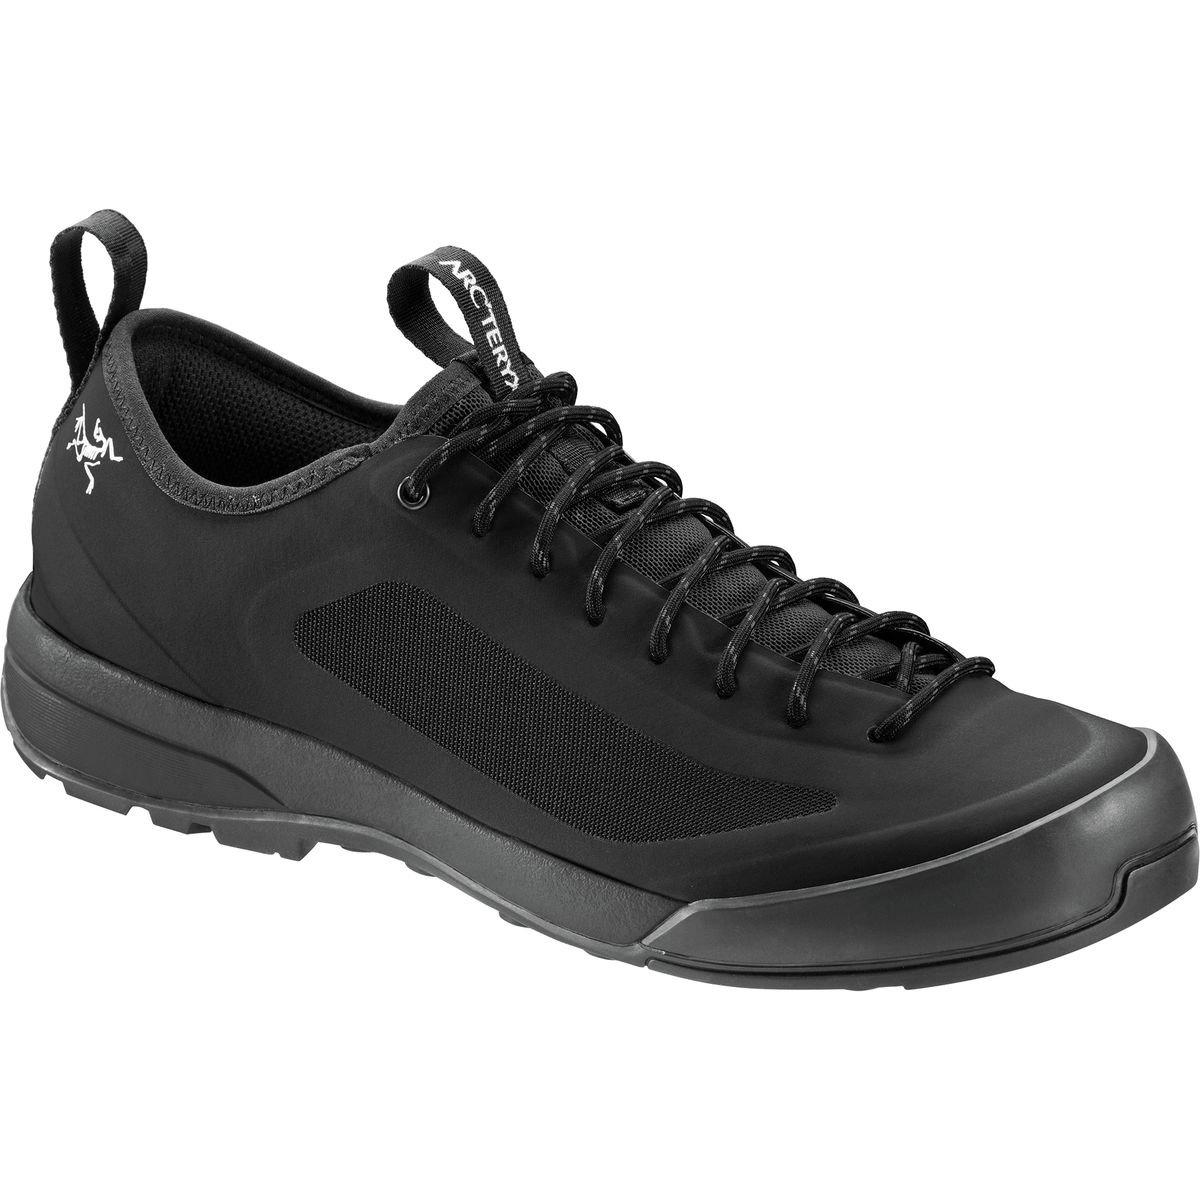 Arc'teryx Acrux SL Approach Shoes - Women's B01GFEWGP6 8 B(M) US|Black/Black